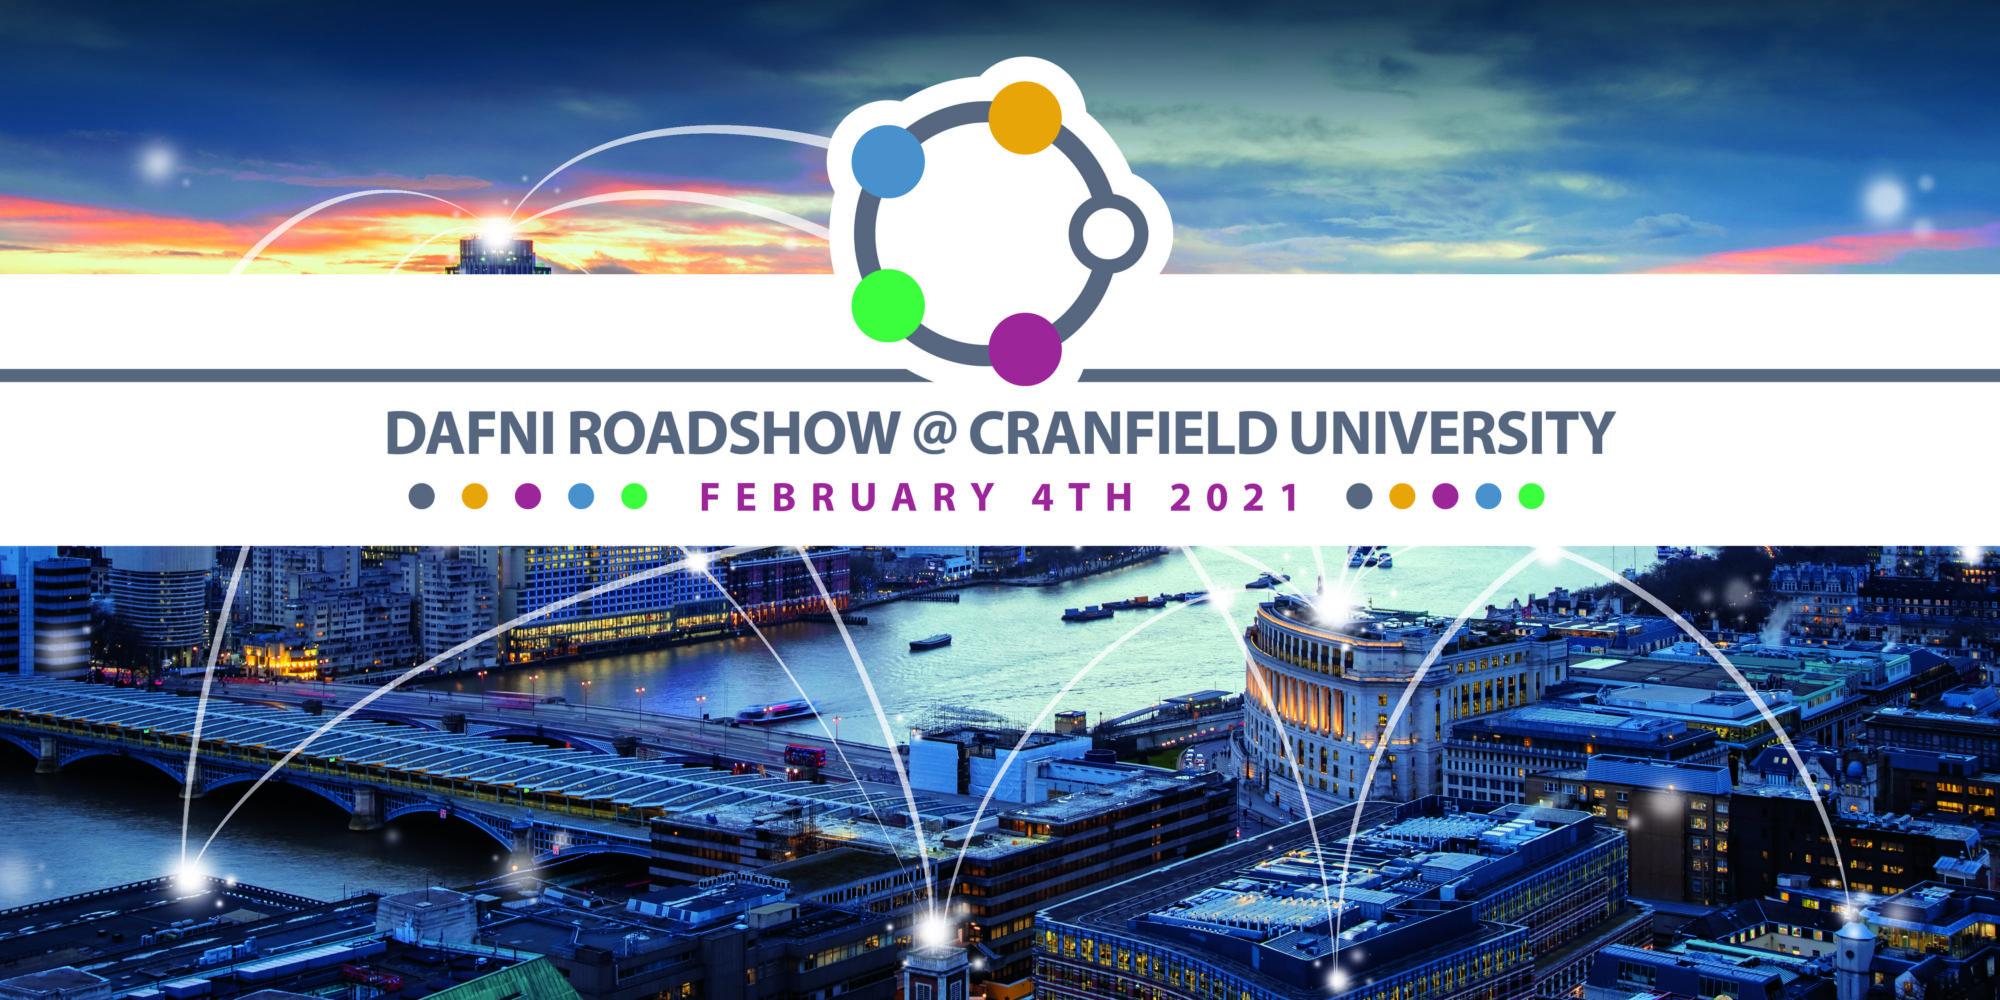 Cranfield University Roadshow